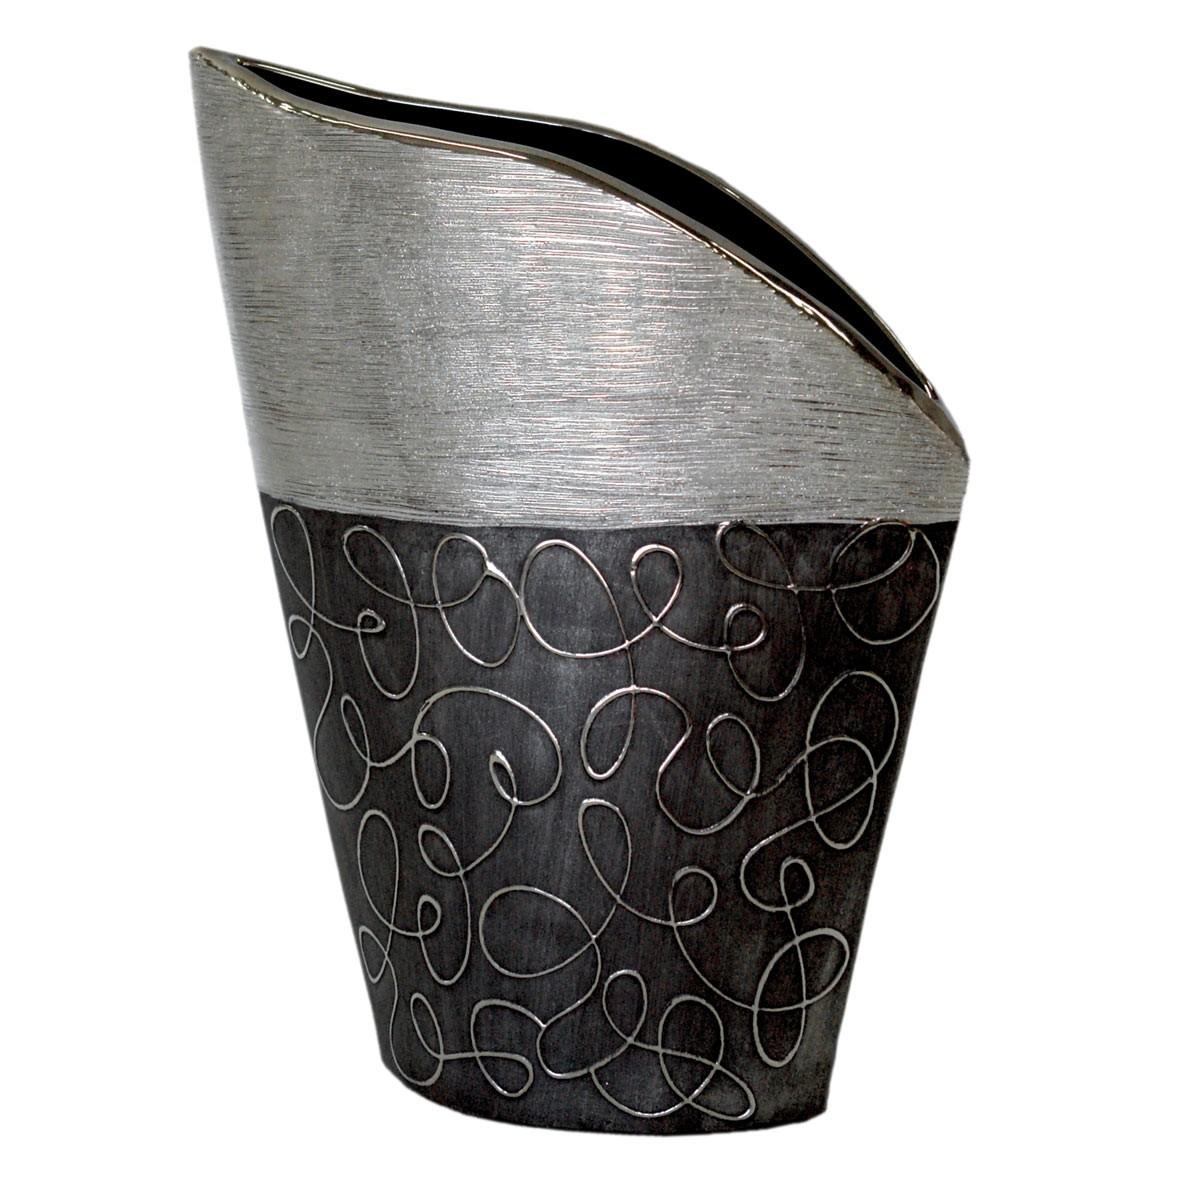 Gilde Vase Stella Hoehe 26cm Keramik Anthrazit Silber 24